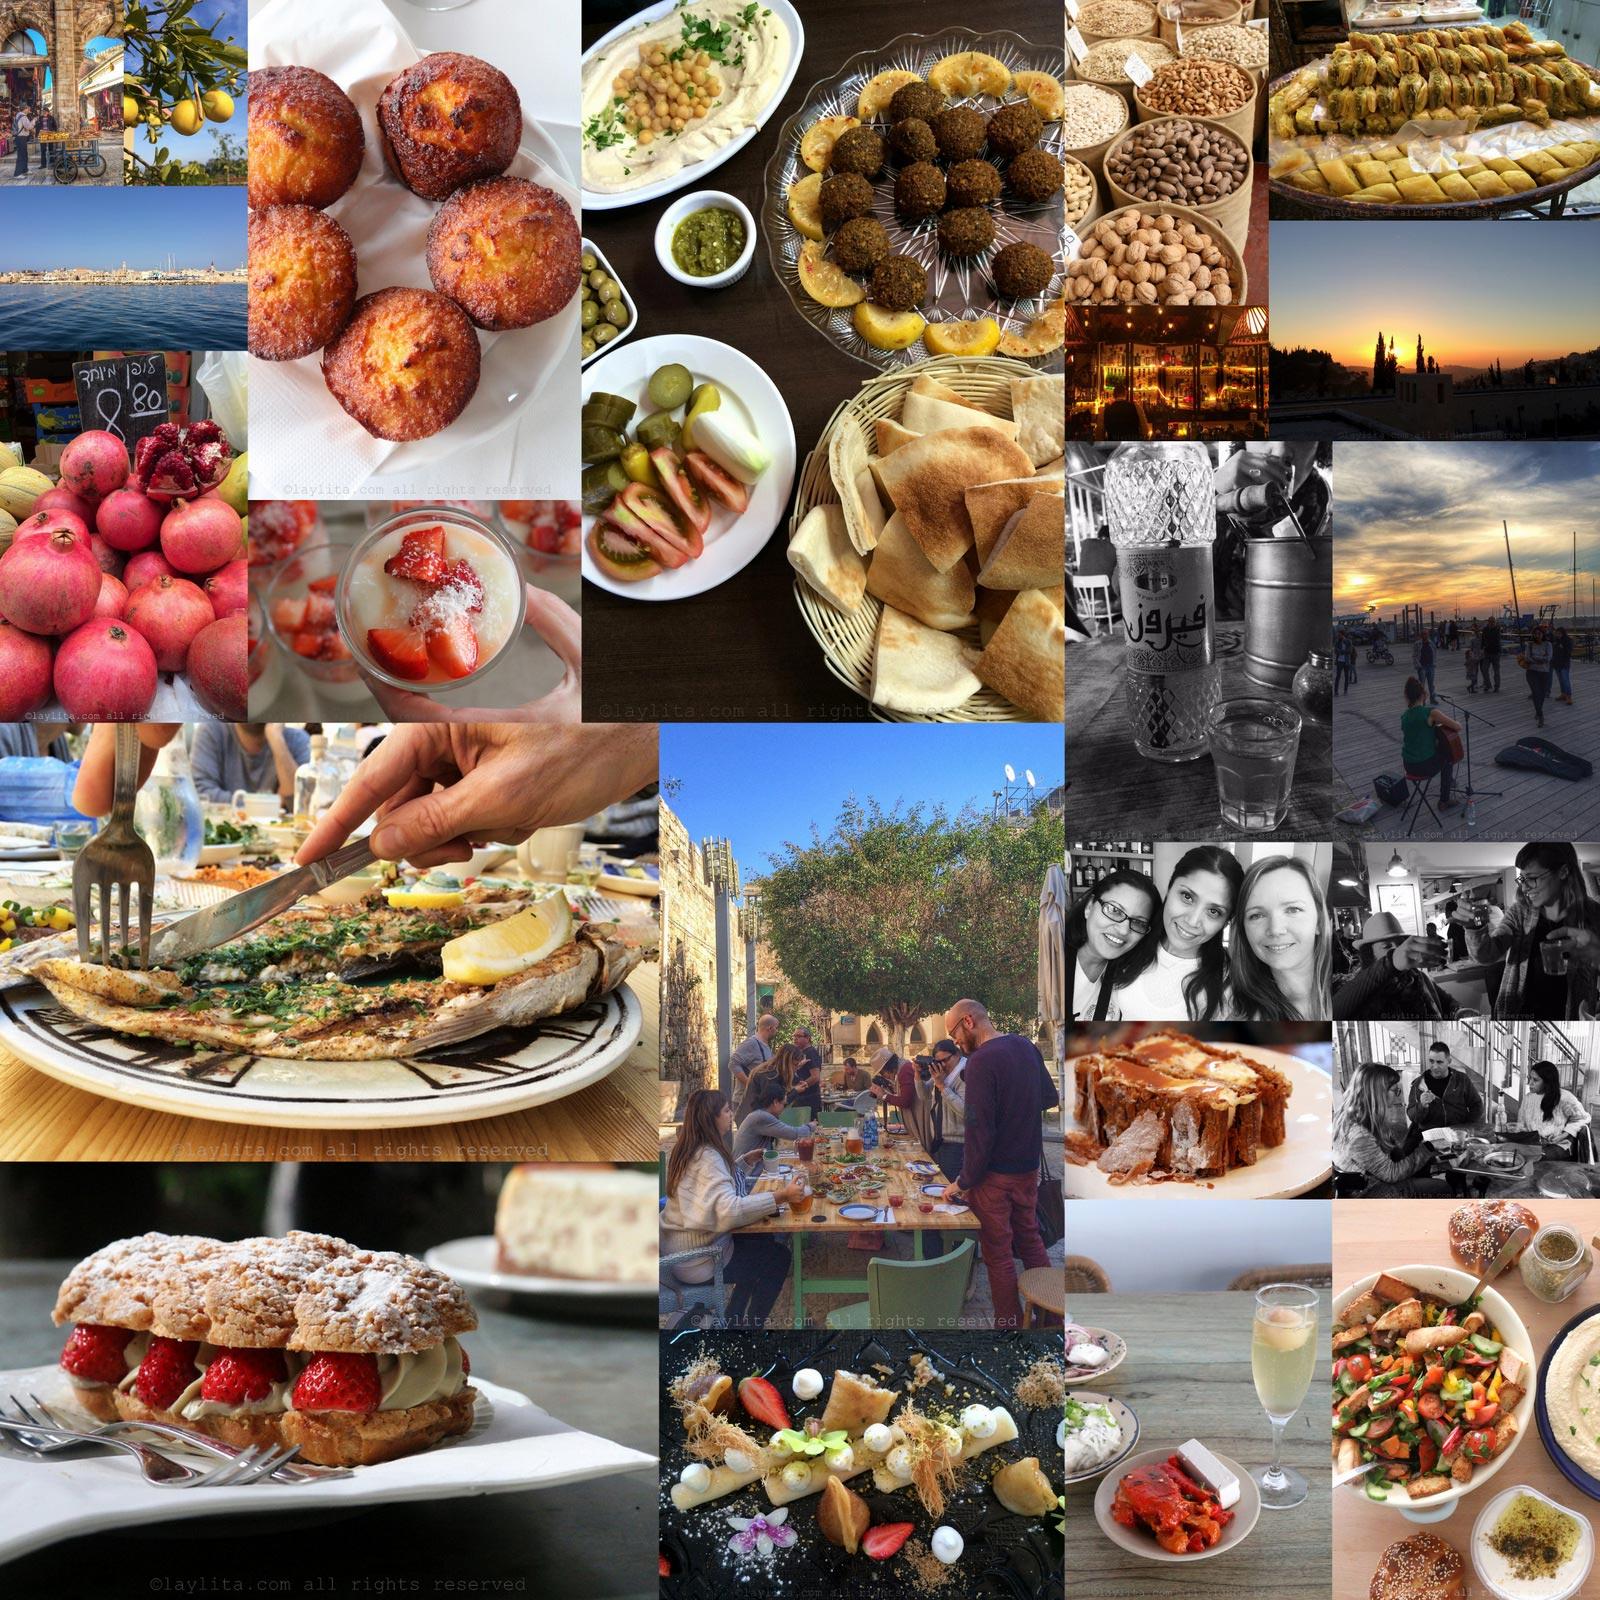 Vibe Israel Comida food blogger trip